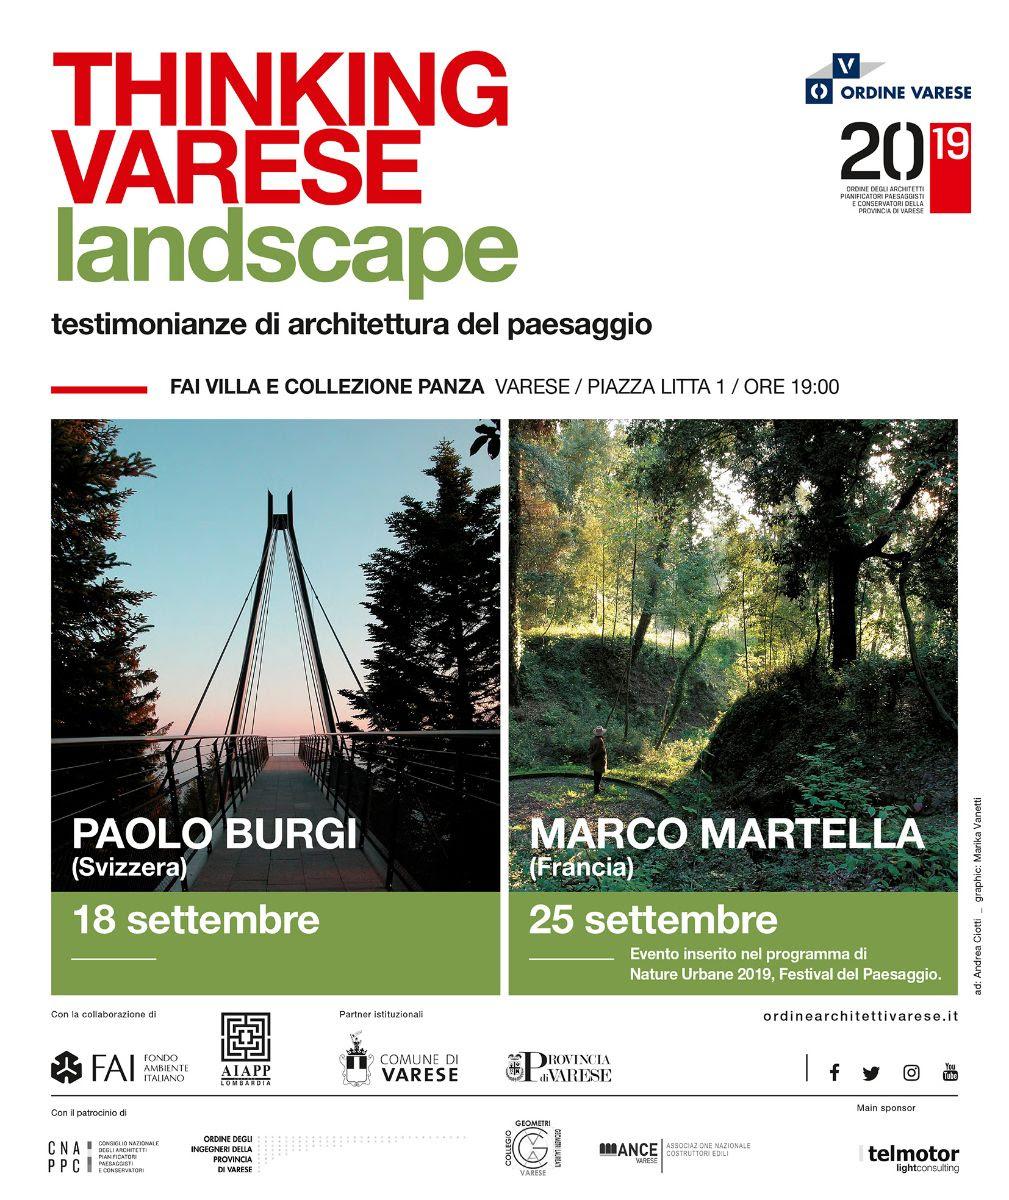 Imprese Edili Varese E Provincia thinking varese ospita paolo burgi e marco martella